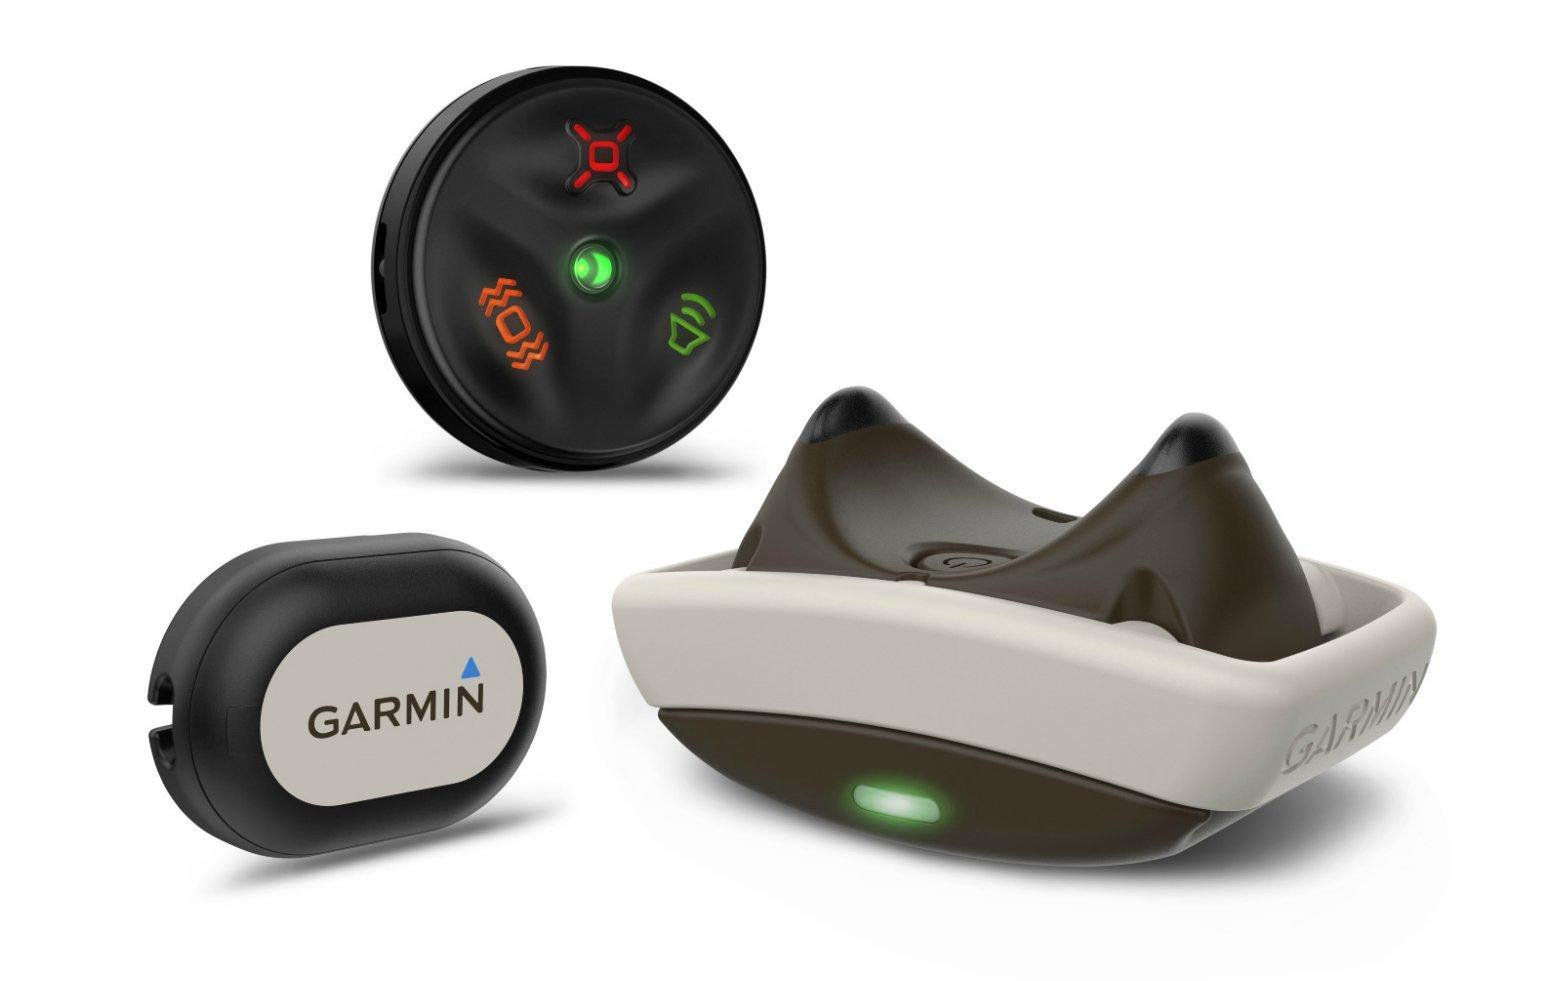 Garmin 010-01548-04 Delta Smart Premium Bundle with Keep Away Tag & Canine Remote